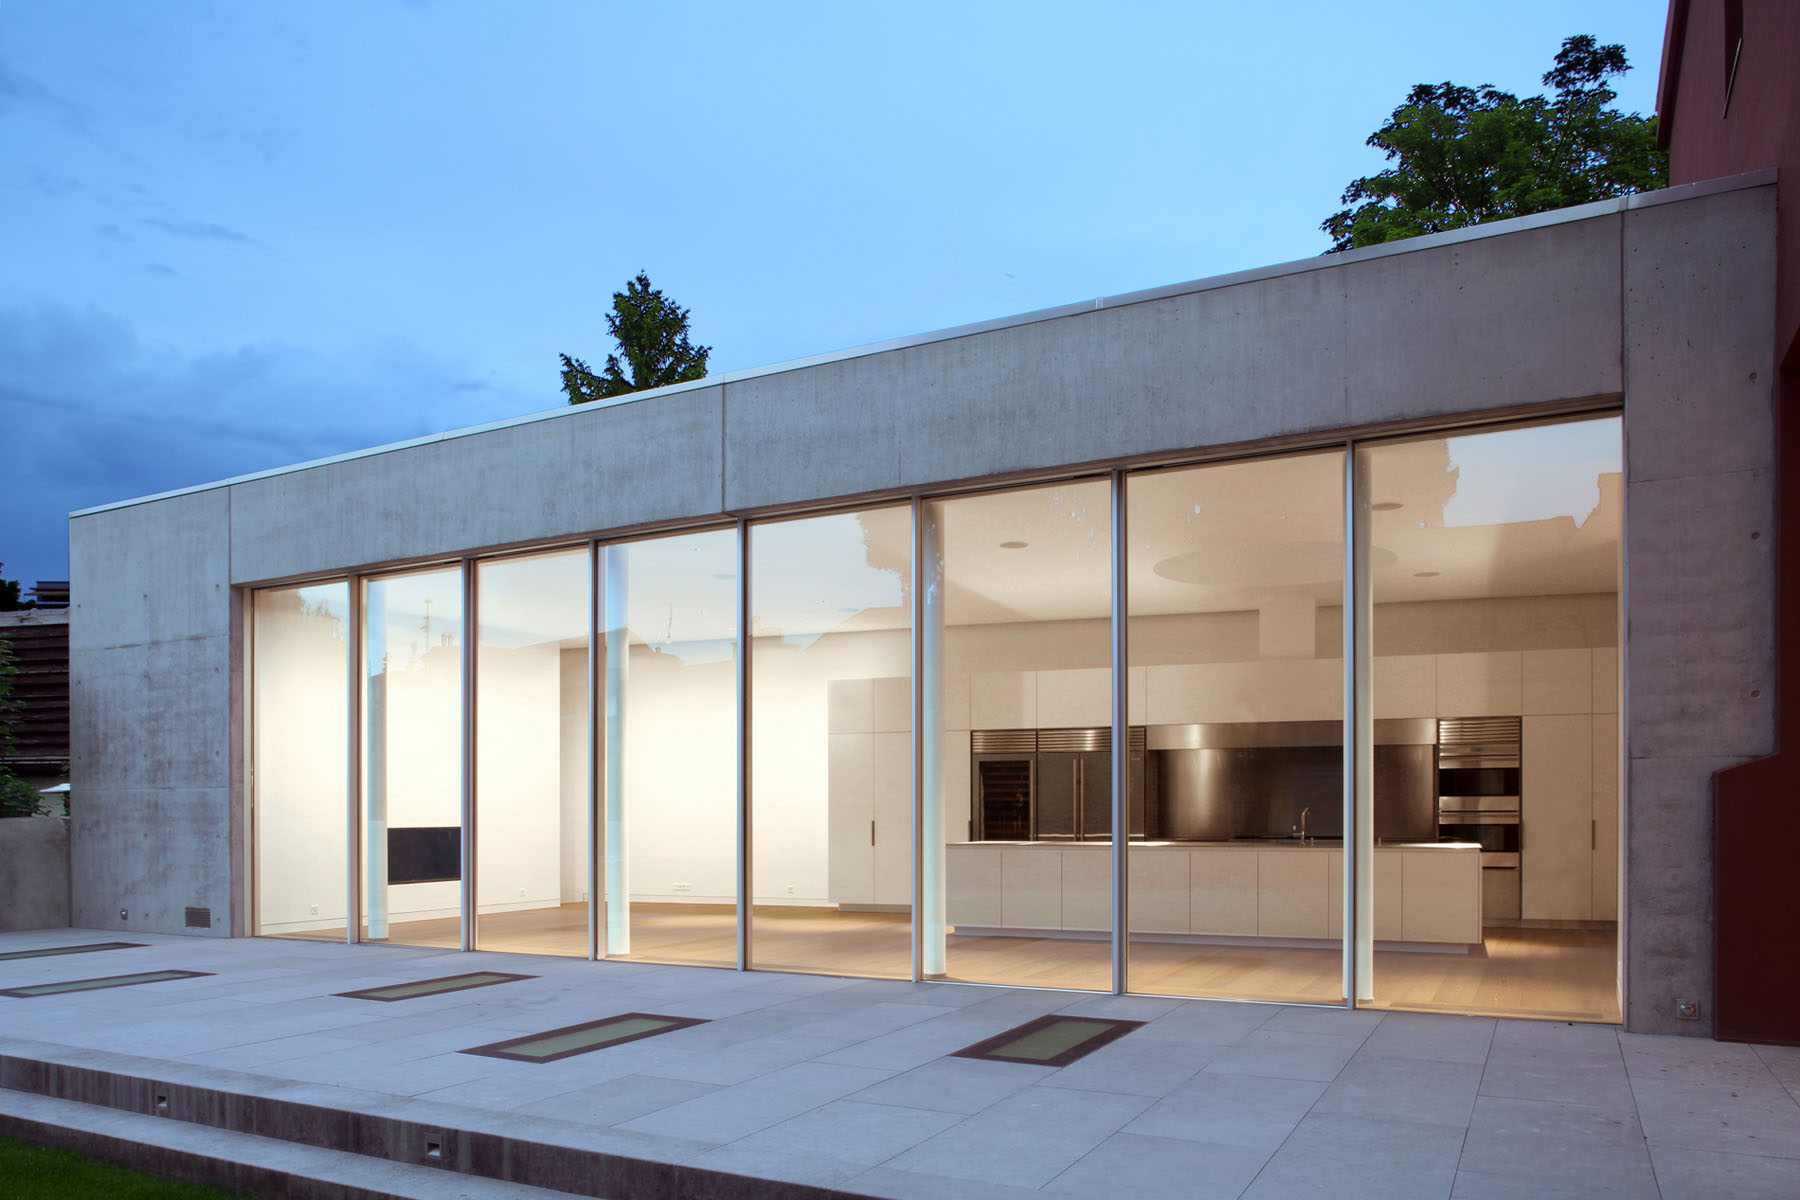 reconversion d 39 une usine en loft carouge gen ve. Black Bedroom Furniture Sets. Home Design Ideas